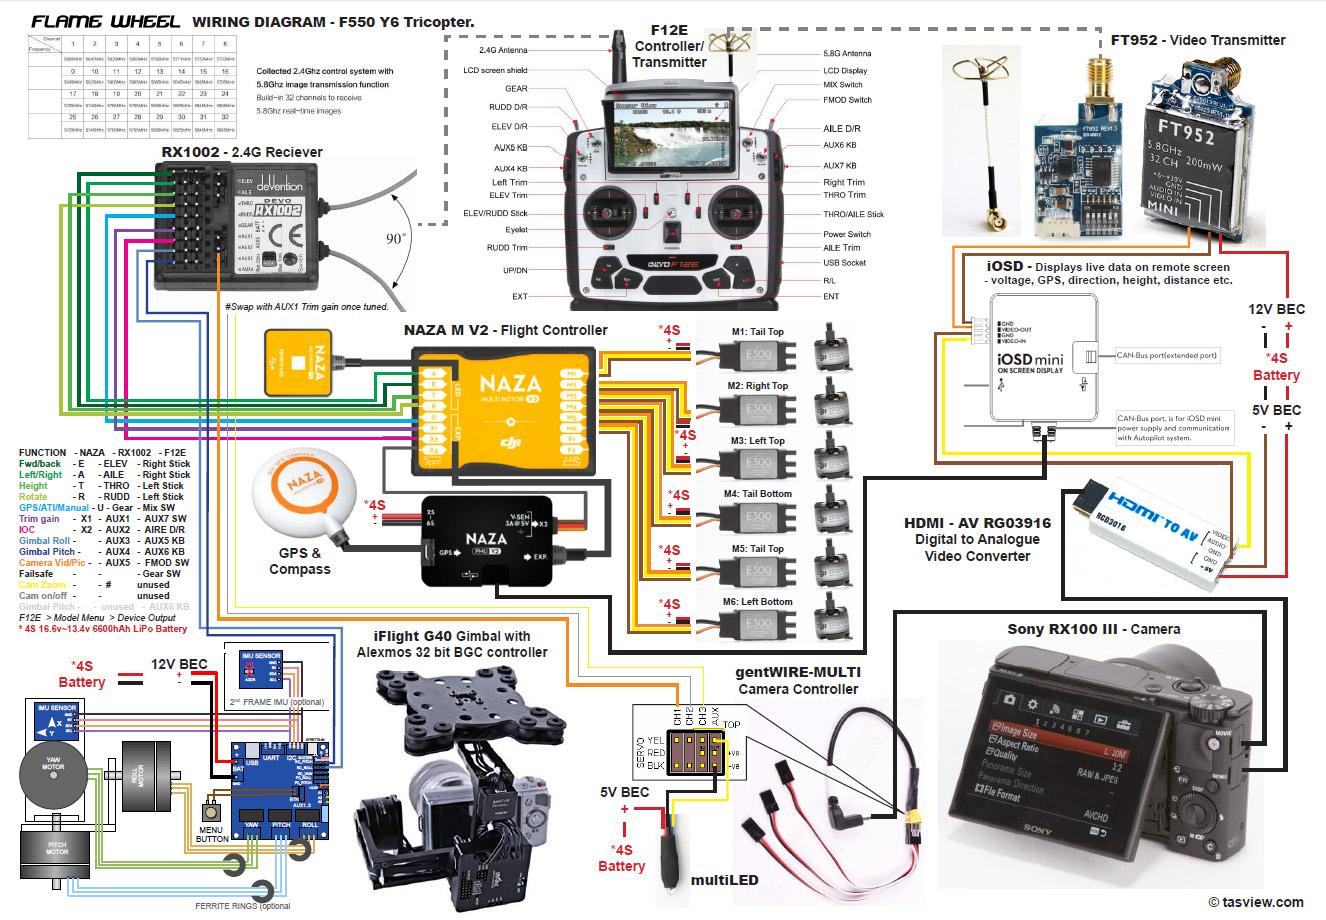 medium resolution of phantom 2 vision wiring diagram simple wiring diagrams house wiring circuits diagram phantom 2 vision wiring